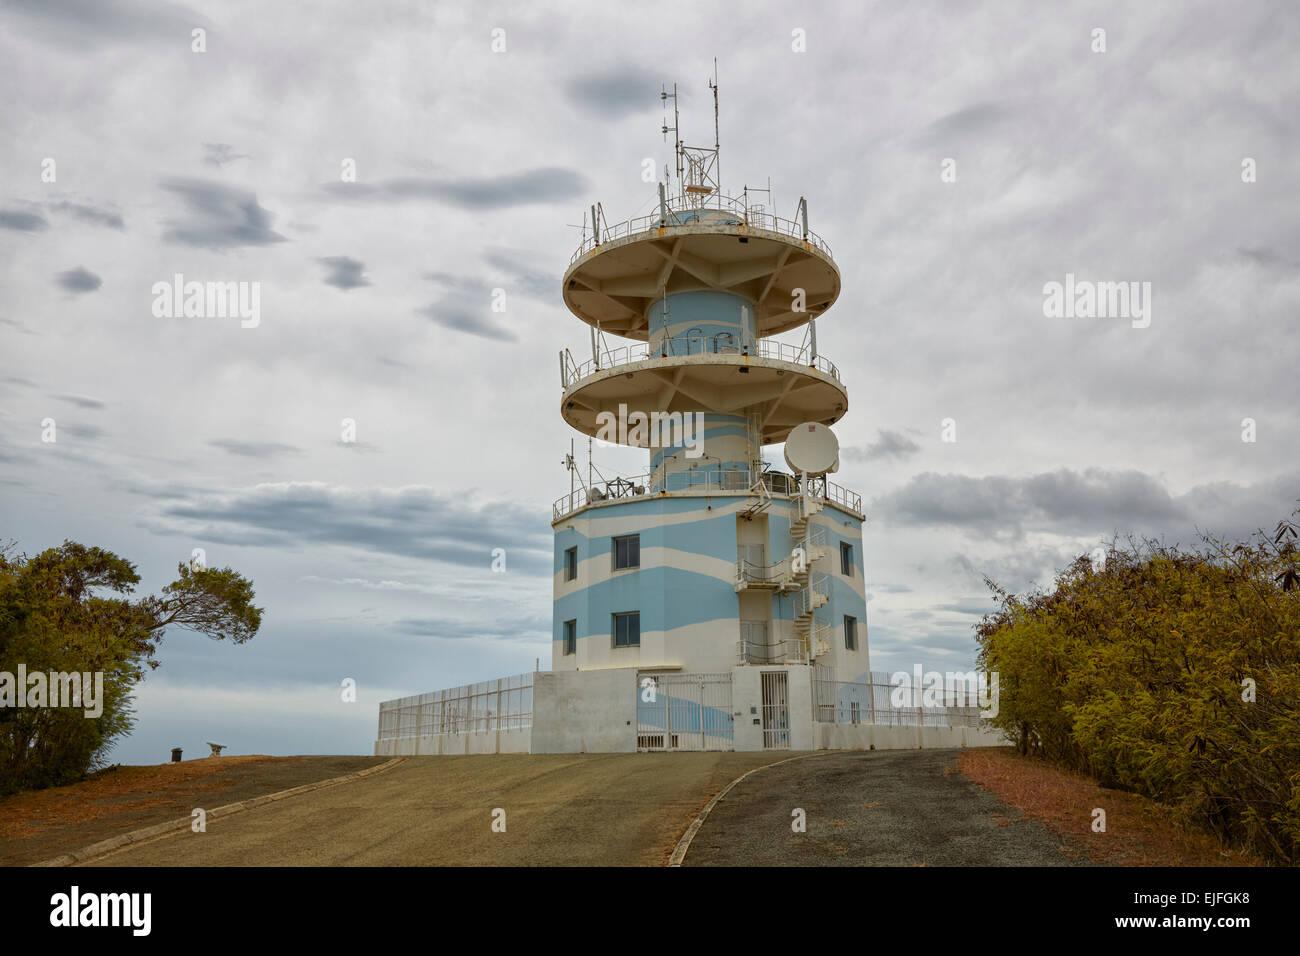 Tour Mobilis de Montravel, Noumea, New Caledonia - Stock Image